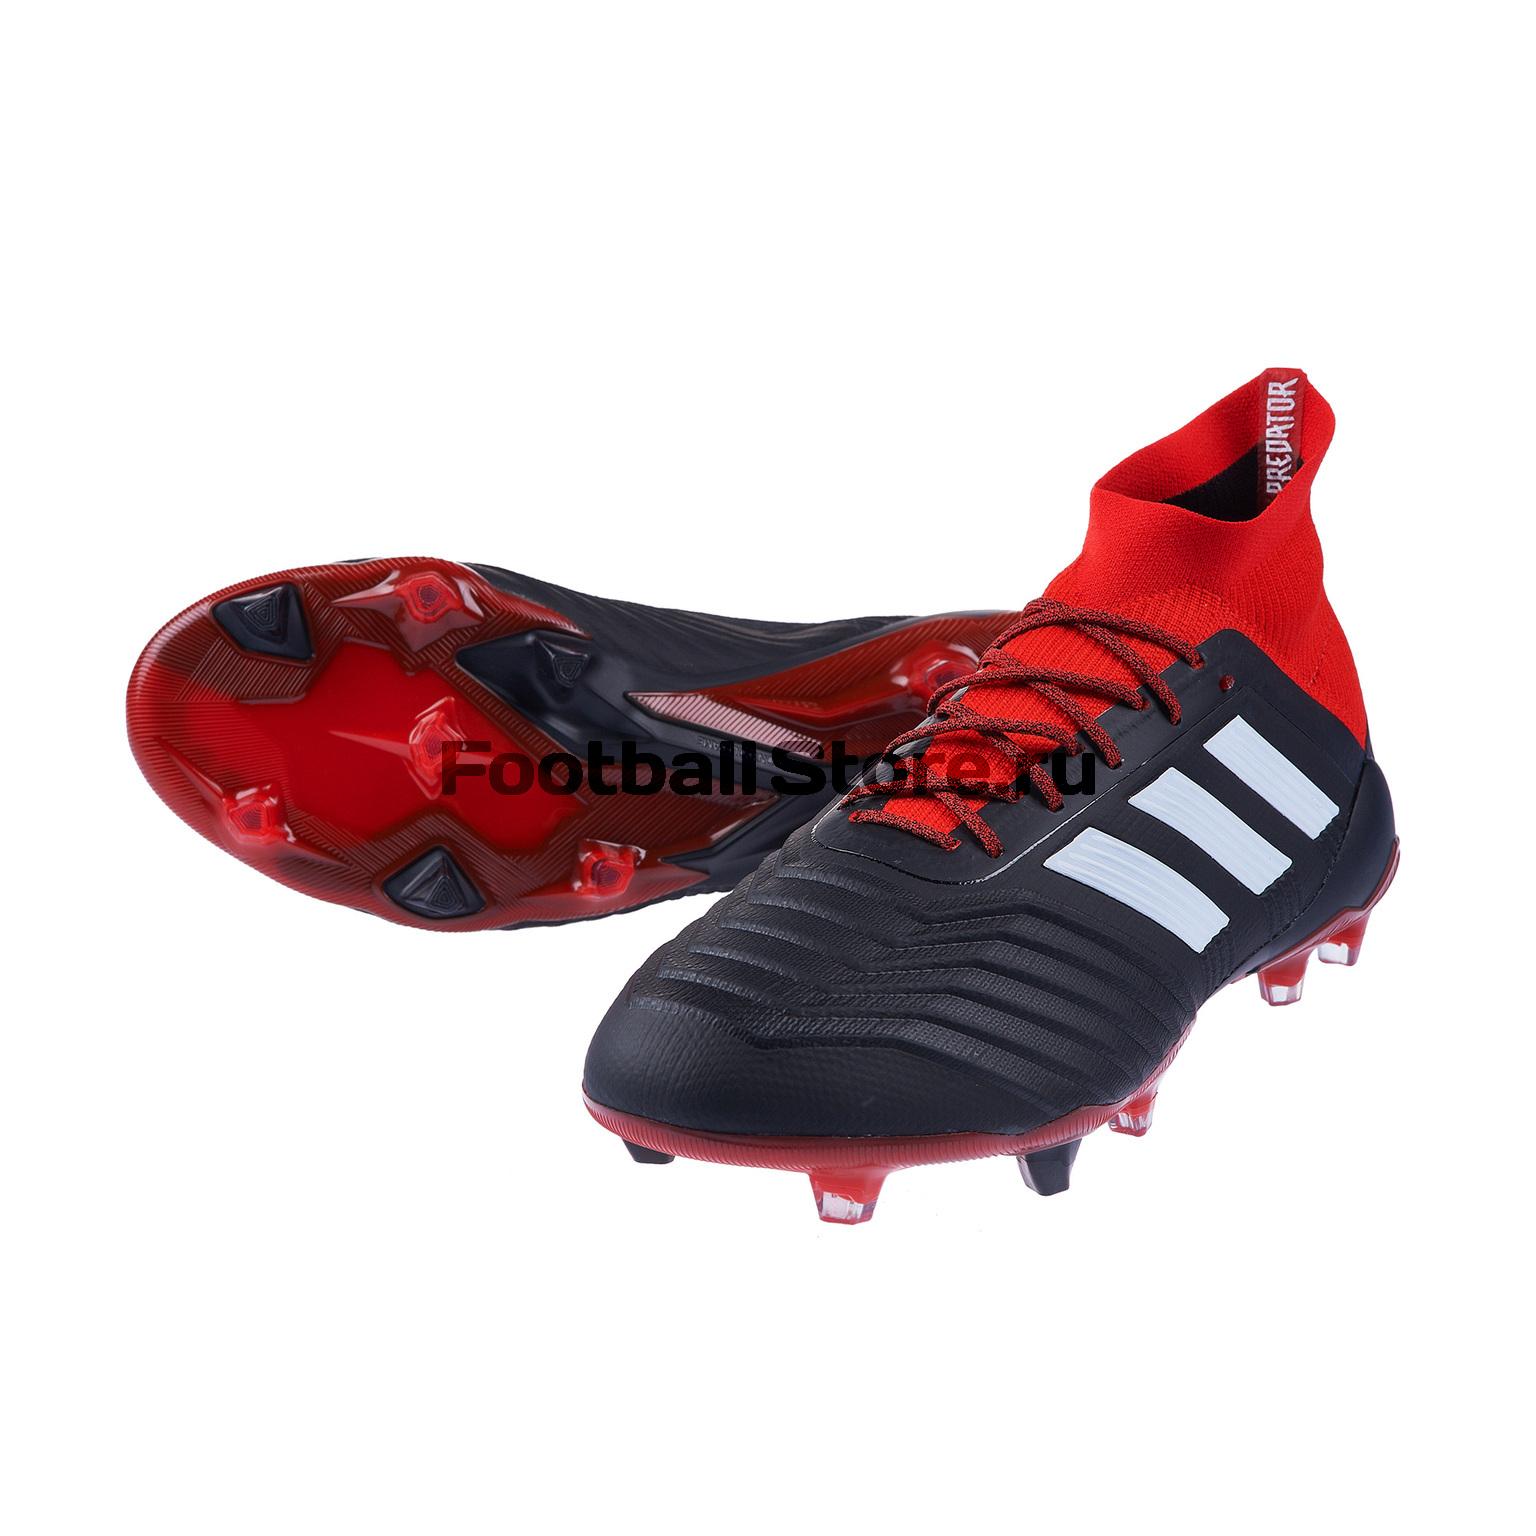 f94f9038 Бутсы Adidas Predator 18.1 FG DB2039 – купить бутсы в интернет ...